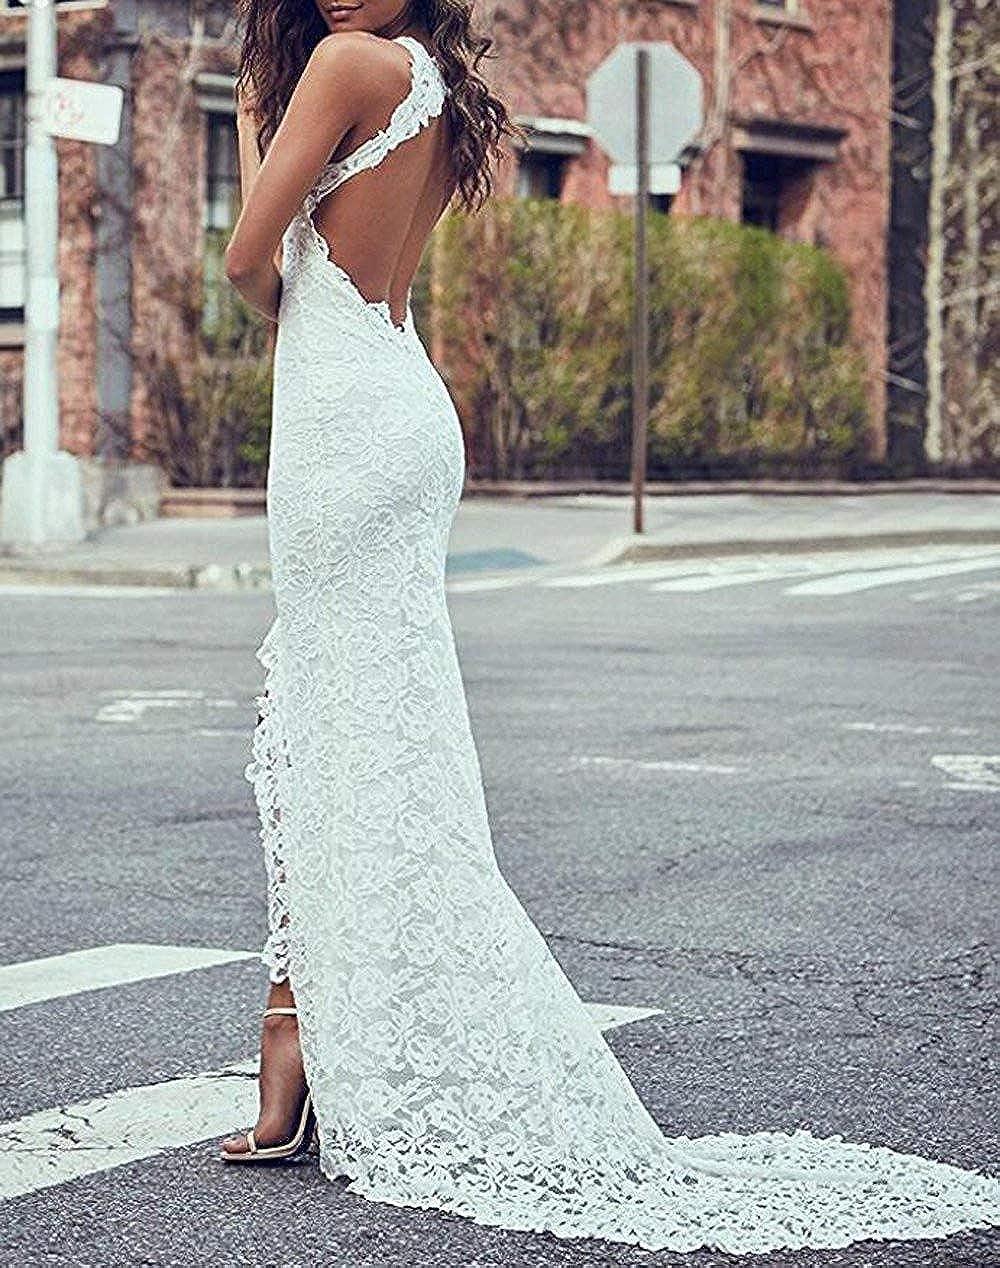 Jdress Womens Bohemian Wedding Dresses Lace Backless Meraid Bridal Gown